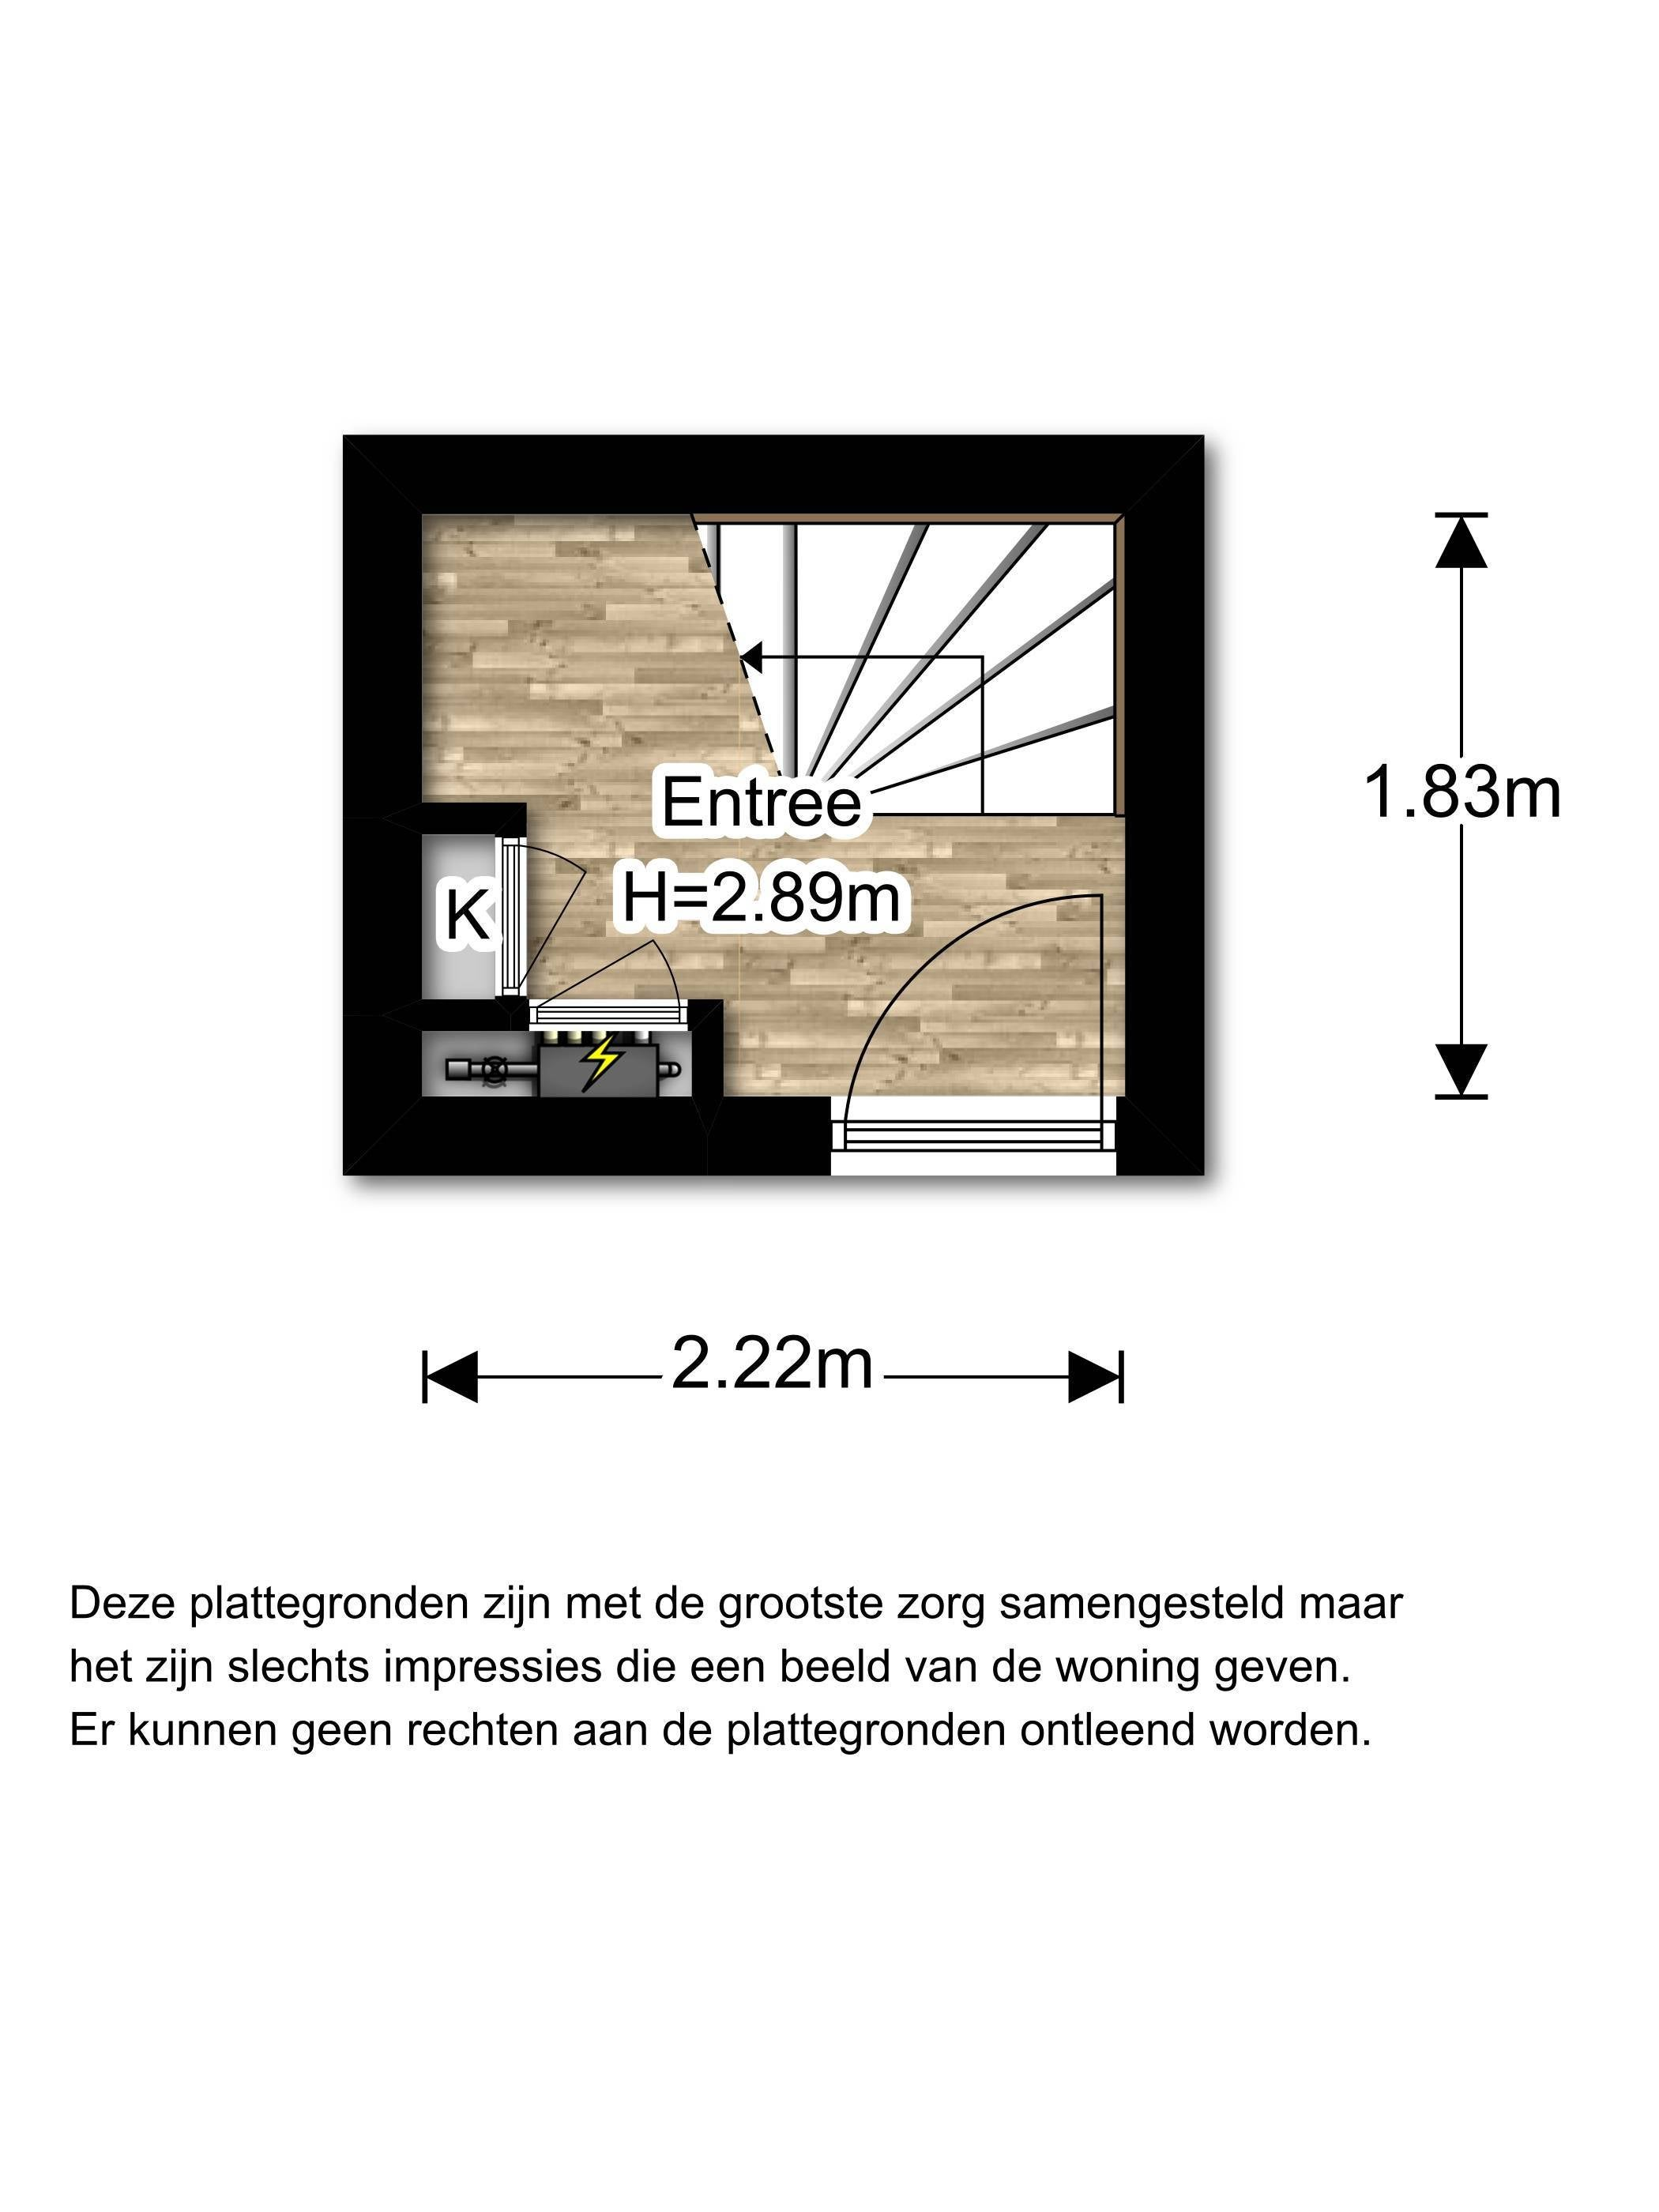 https://public.parariusoffice.nl/242/photos/huge/51538383.1517481270-461.jpg